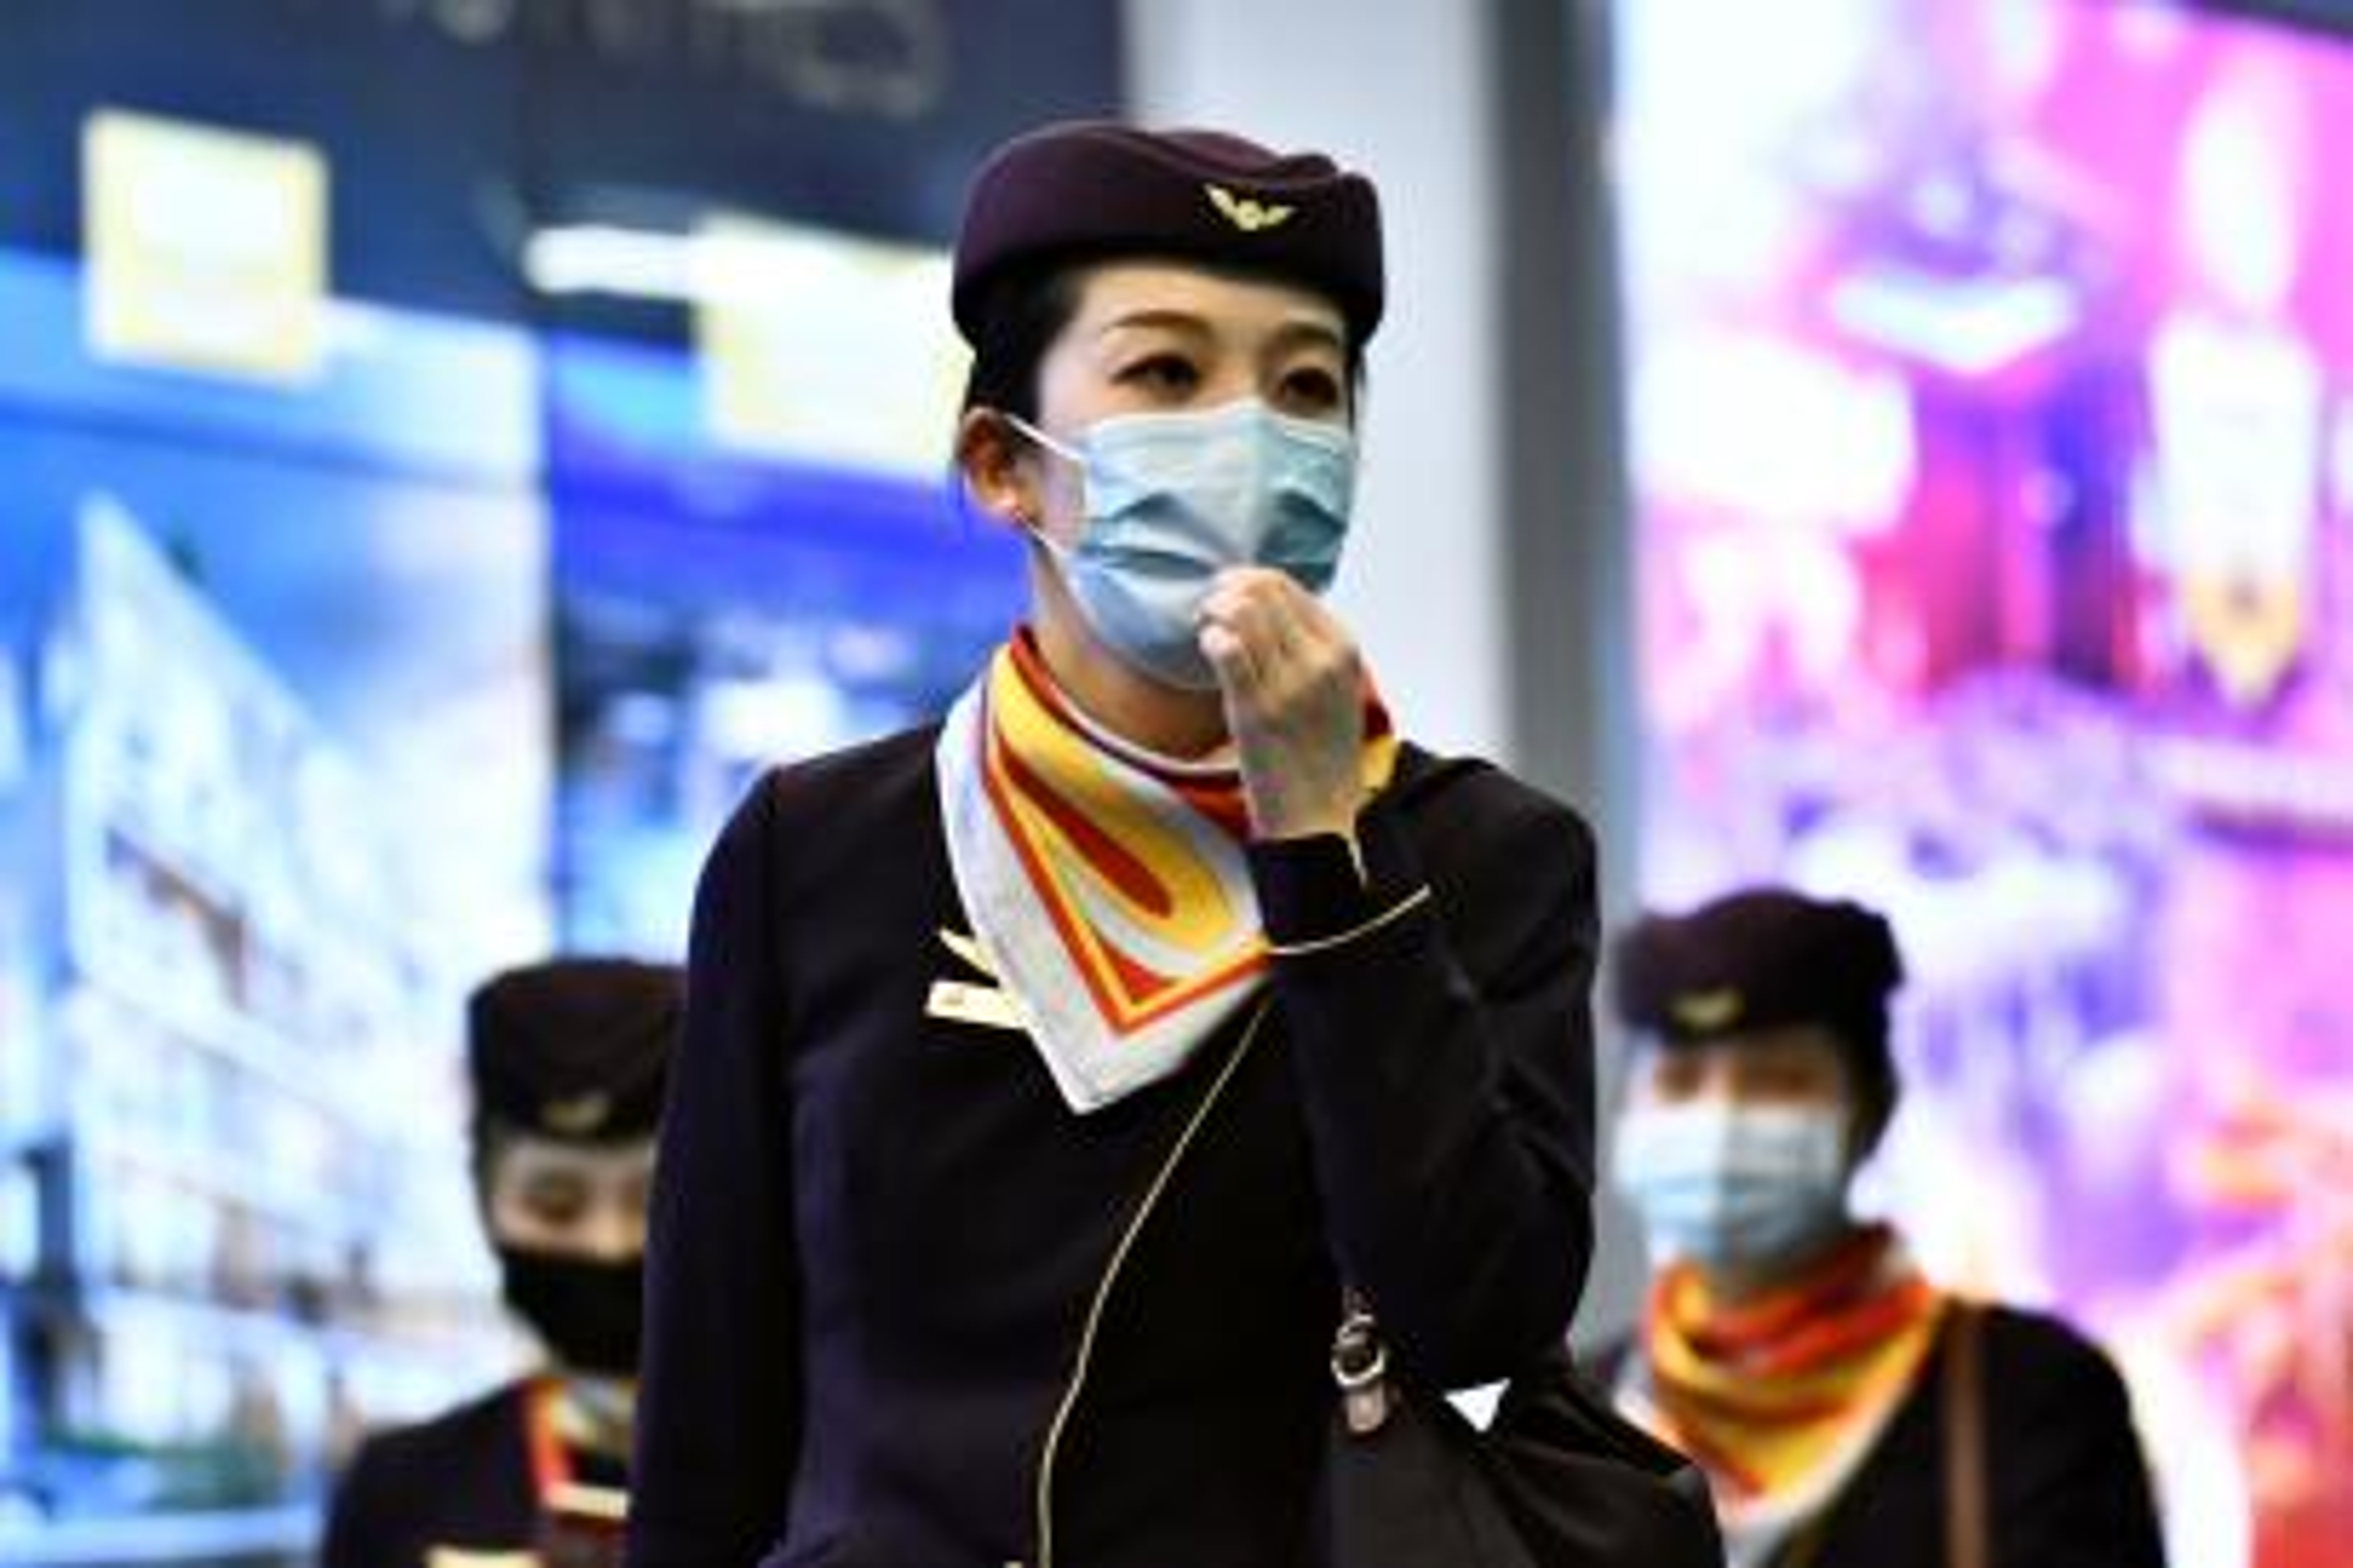 Flight crew wearing face masks.